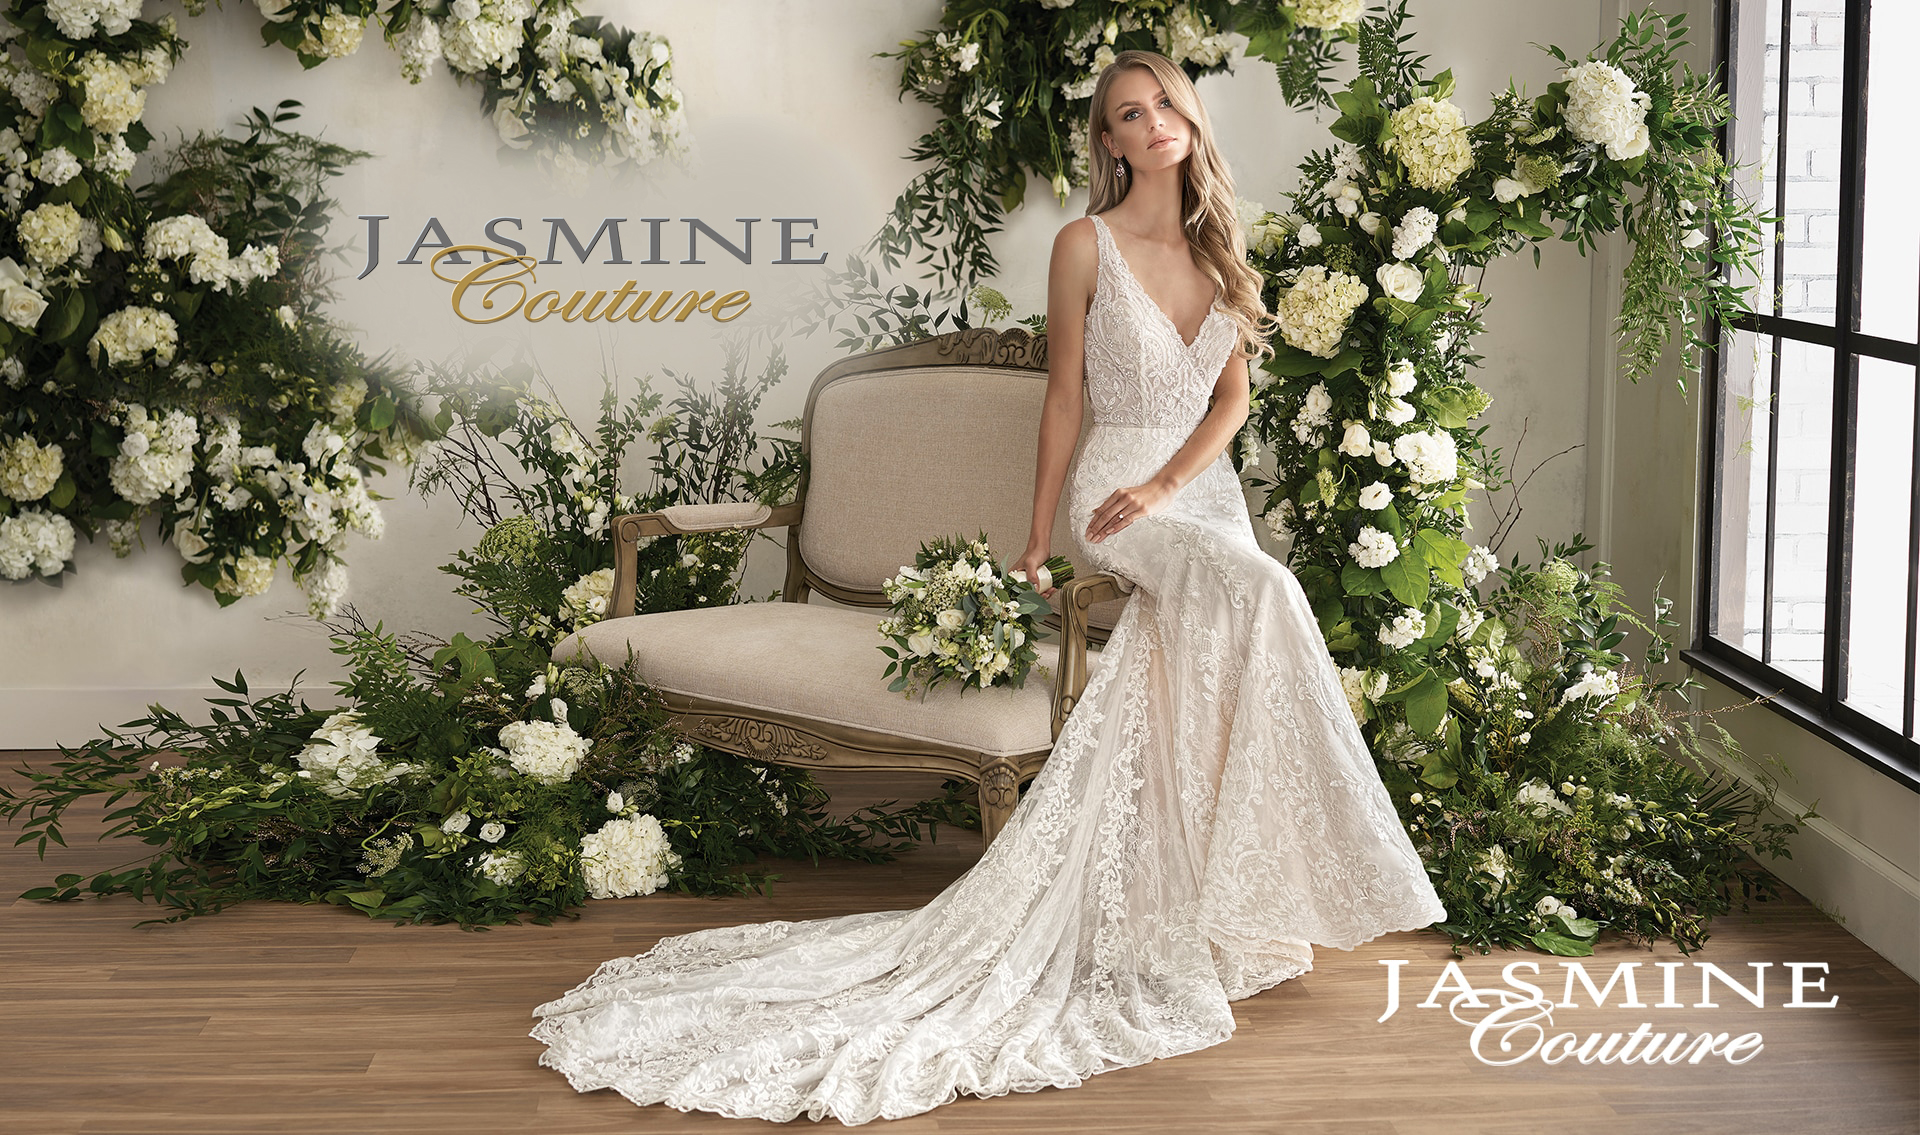 Jasmine-couture.jpg